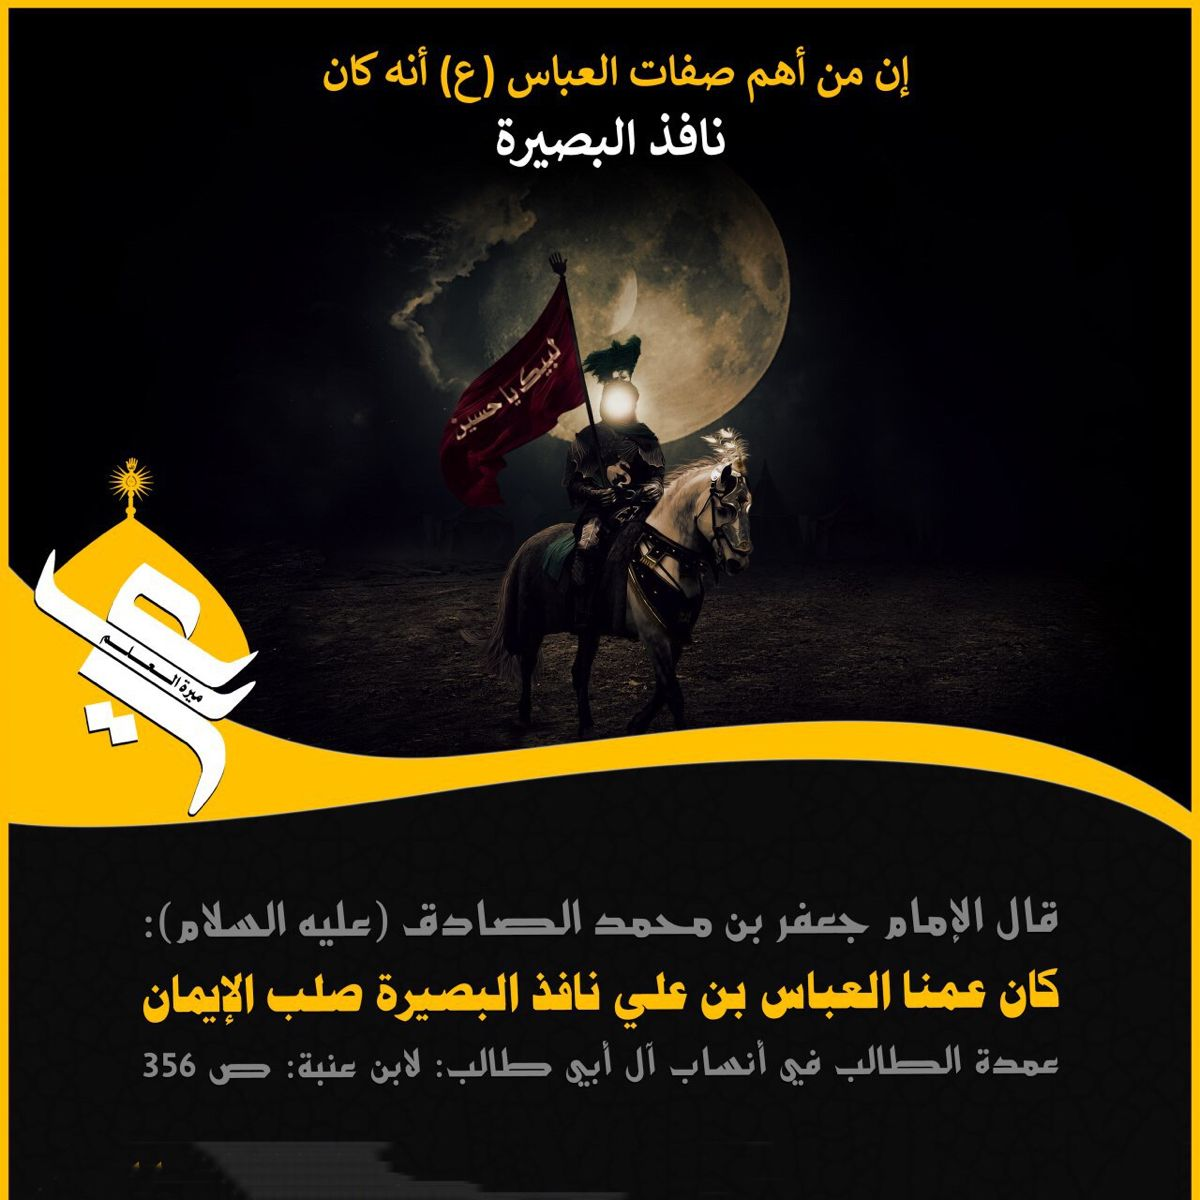 Pin By Aldahan On احاديث ا هل الب يت ص Beautiful Arabic Words Arabic Quotes Movie Posters